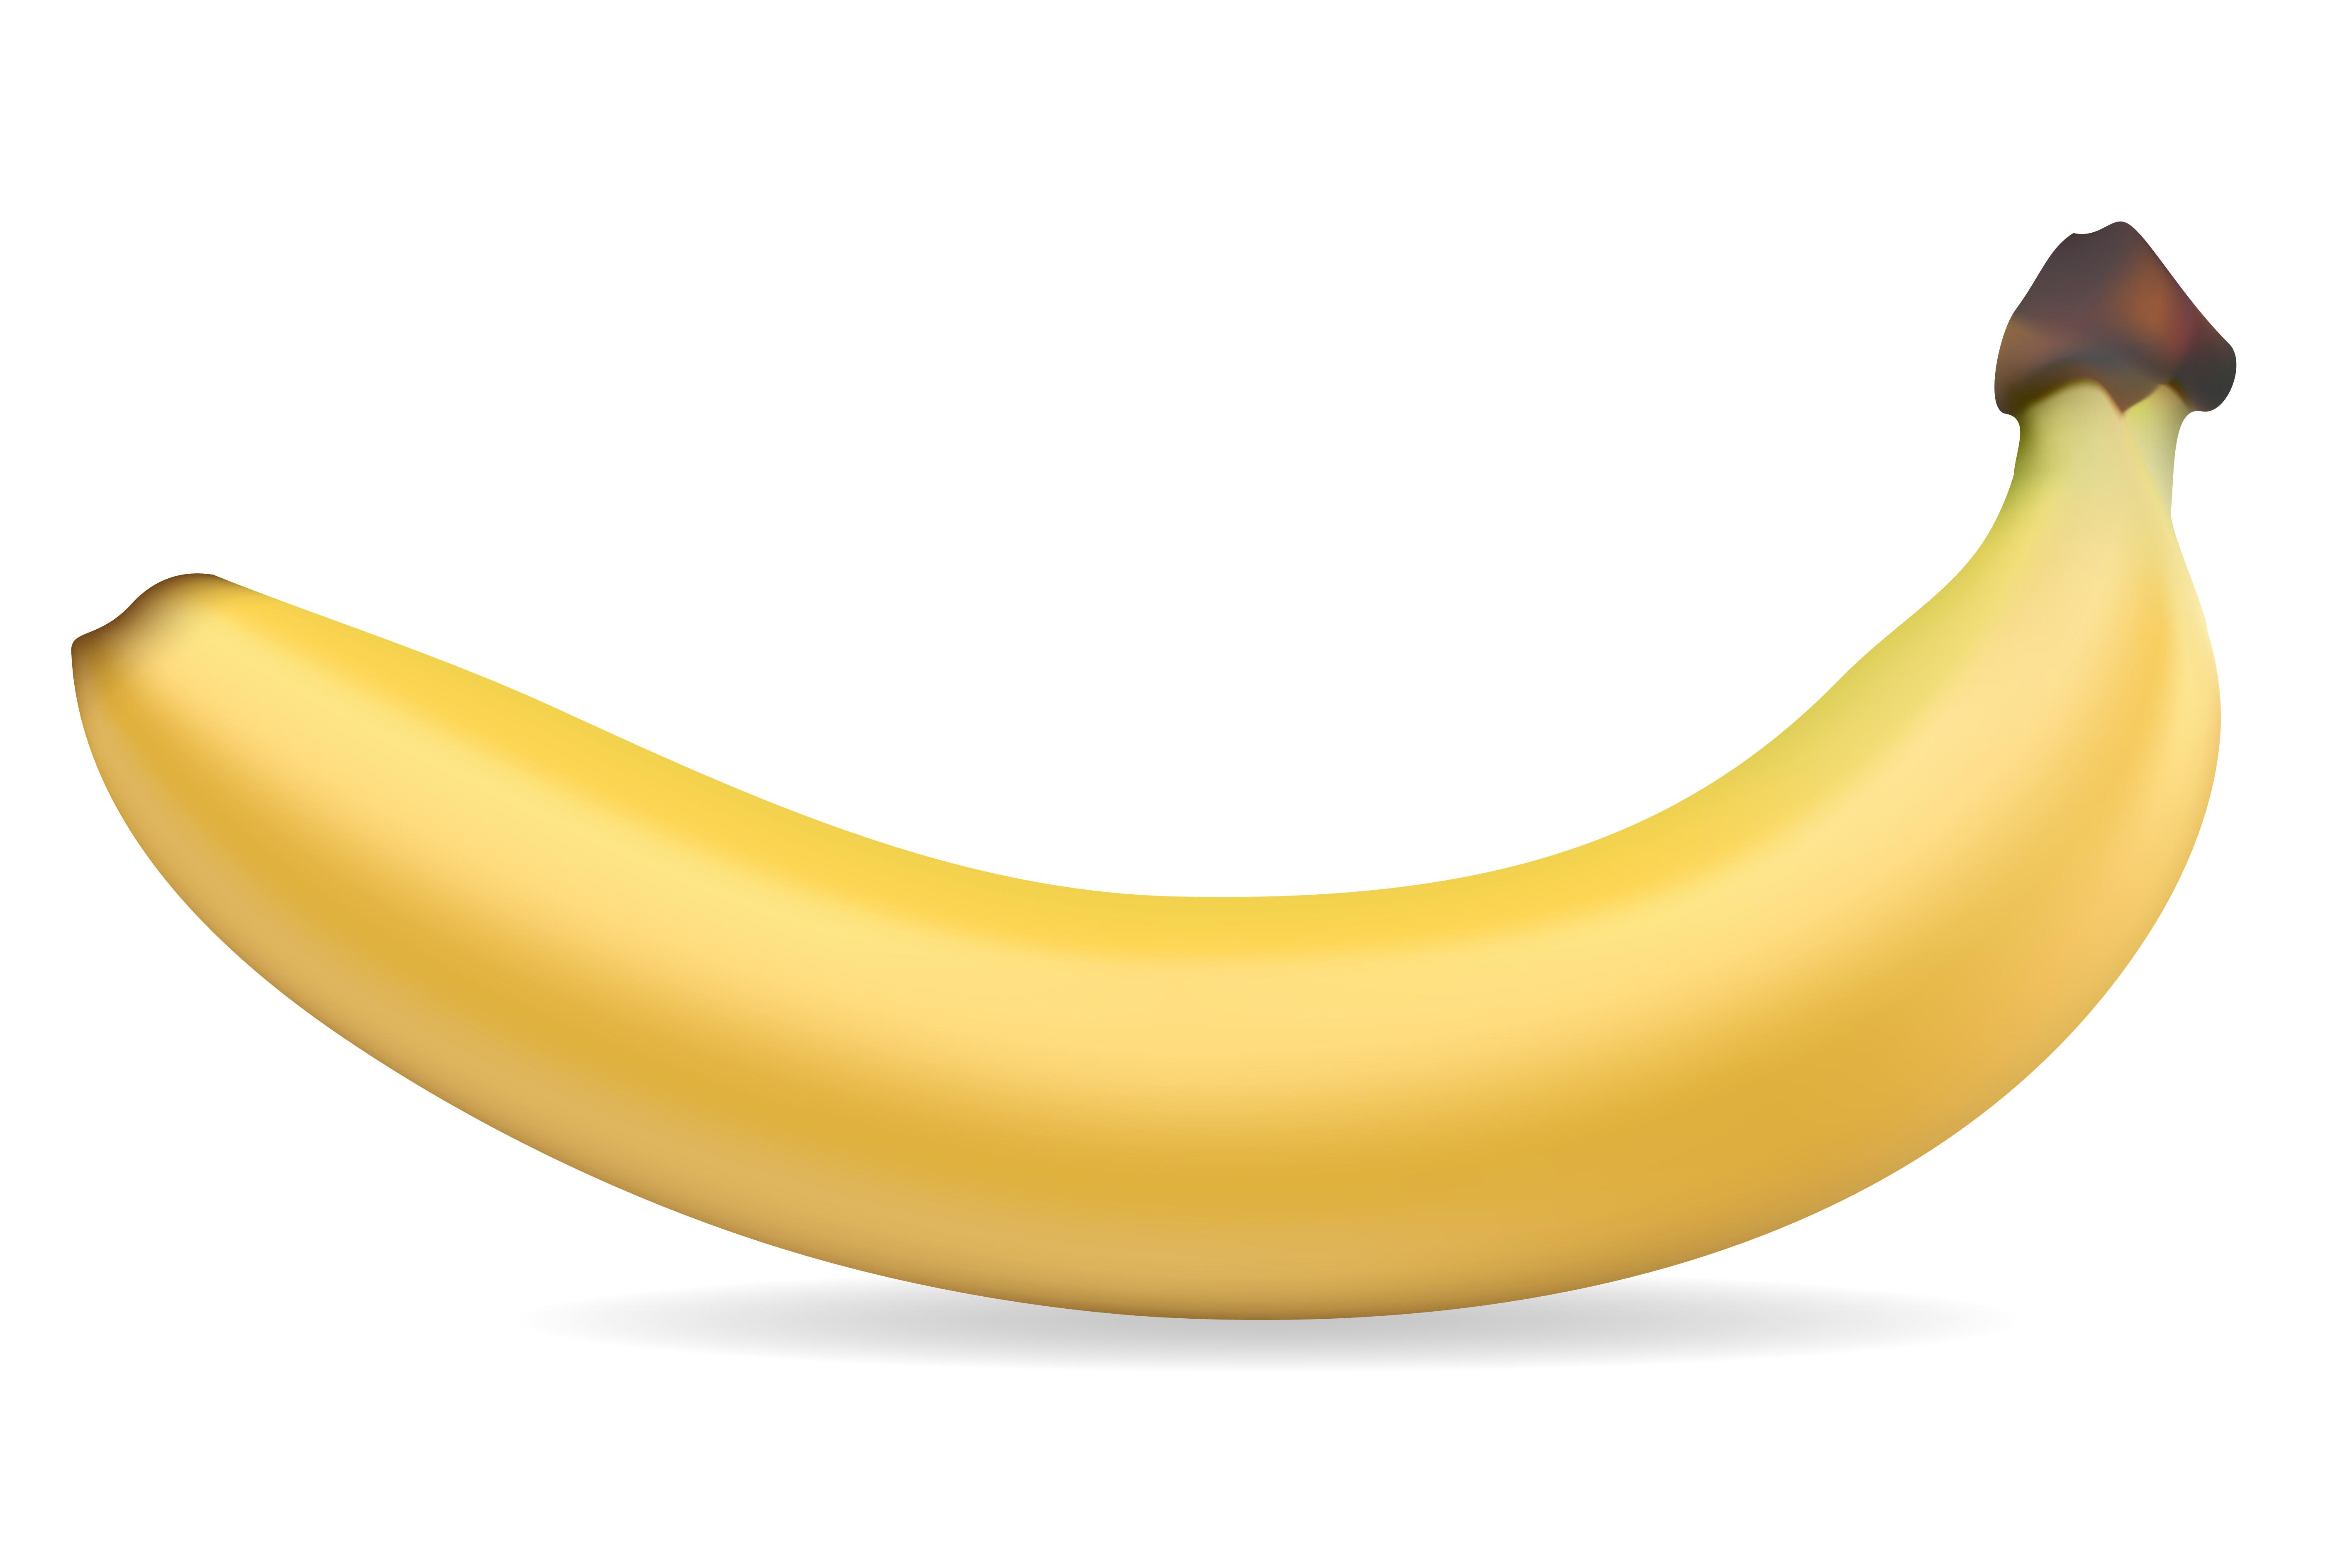 banana vector illustration - Download Free Vectors ...